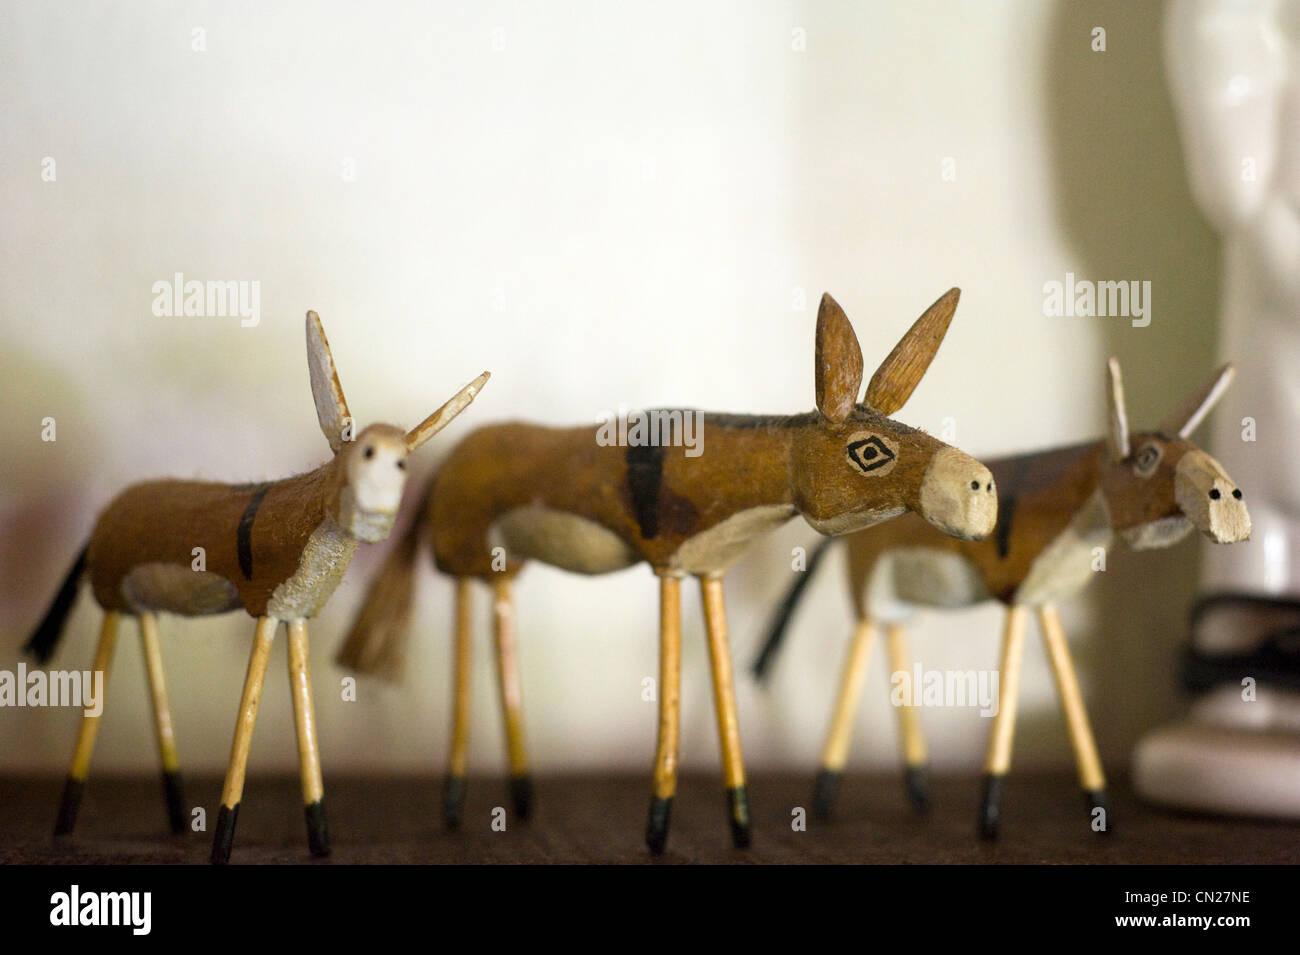 Three ornamental donkeys - Stock Image